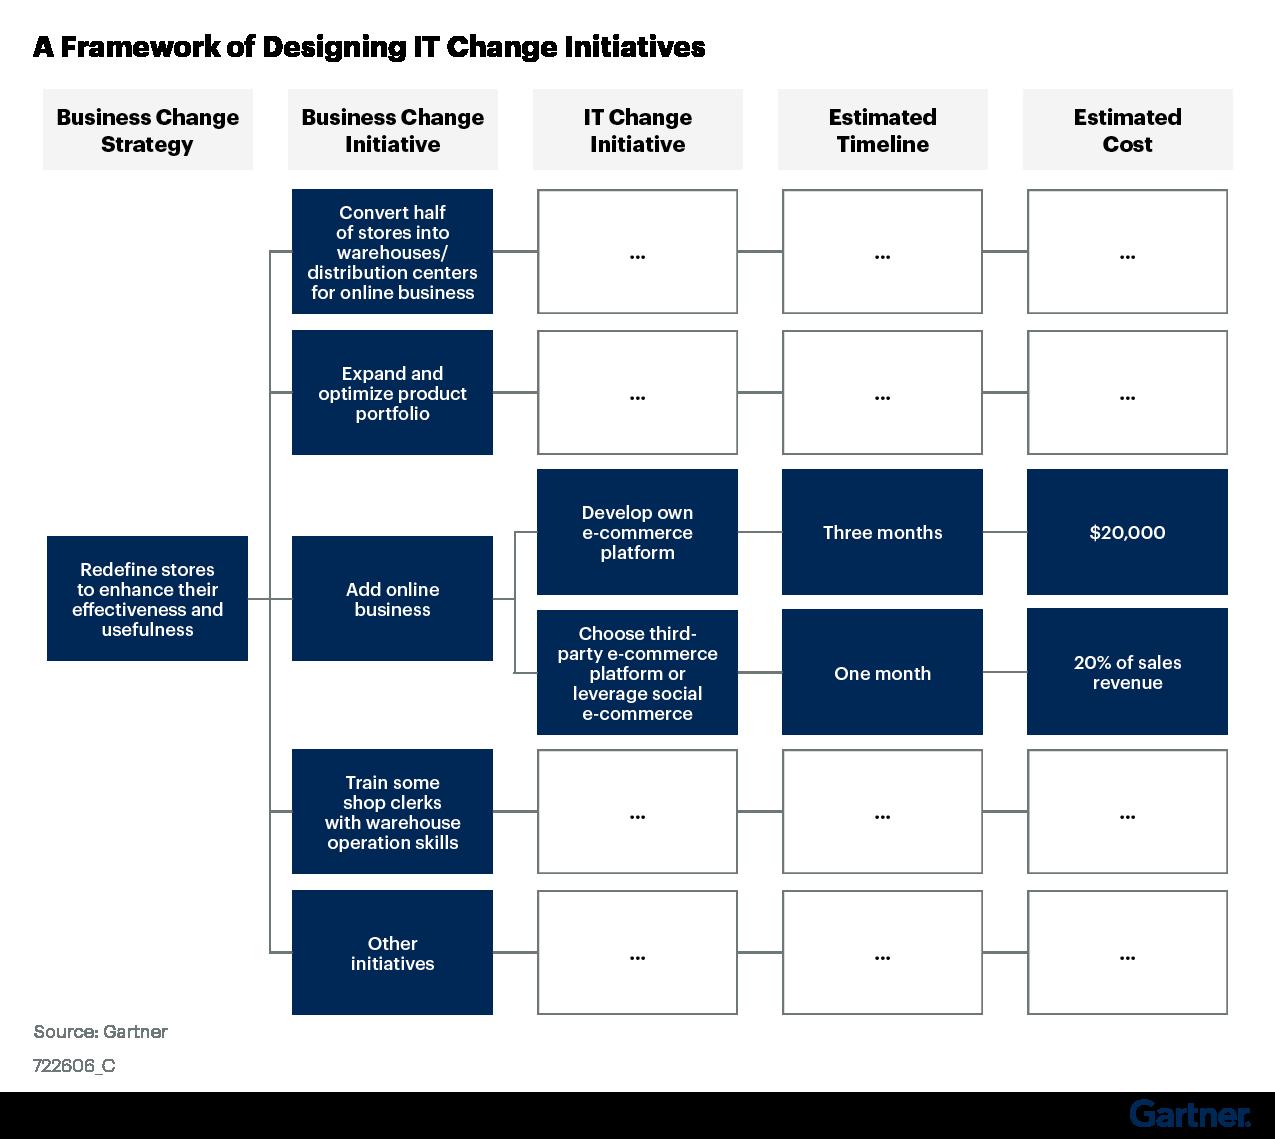 Figure 3: A Framework of Designing IT Change Initiatives